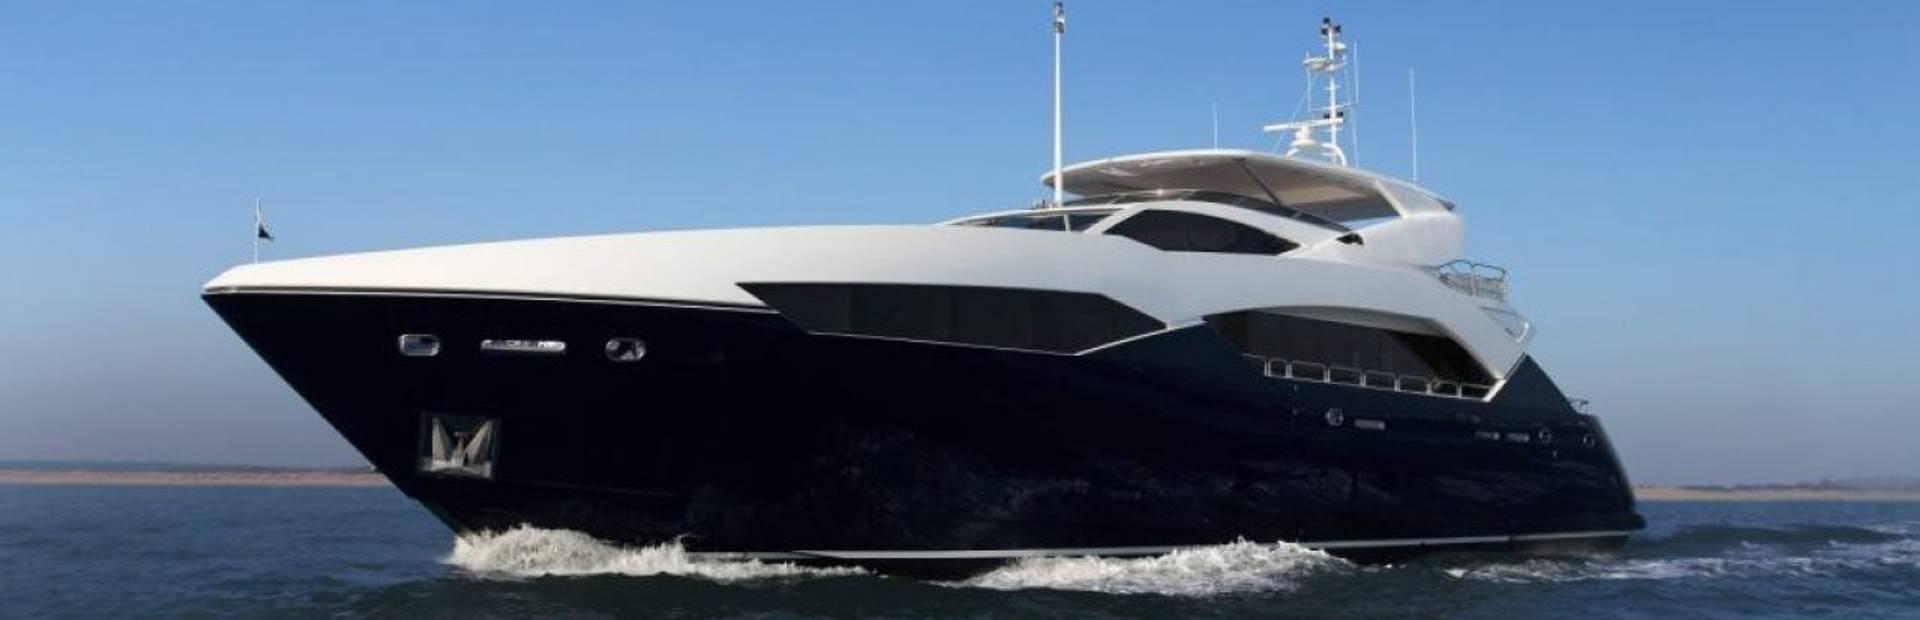 Predator 115 Yacht Charter